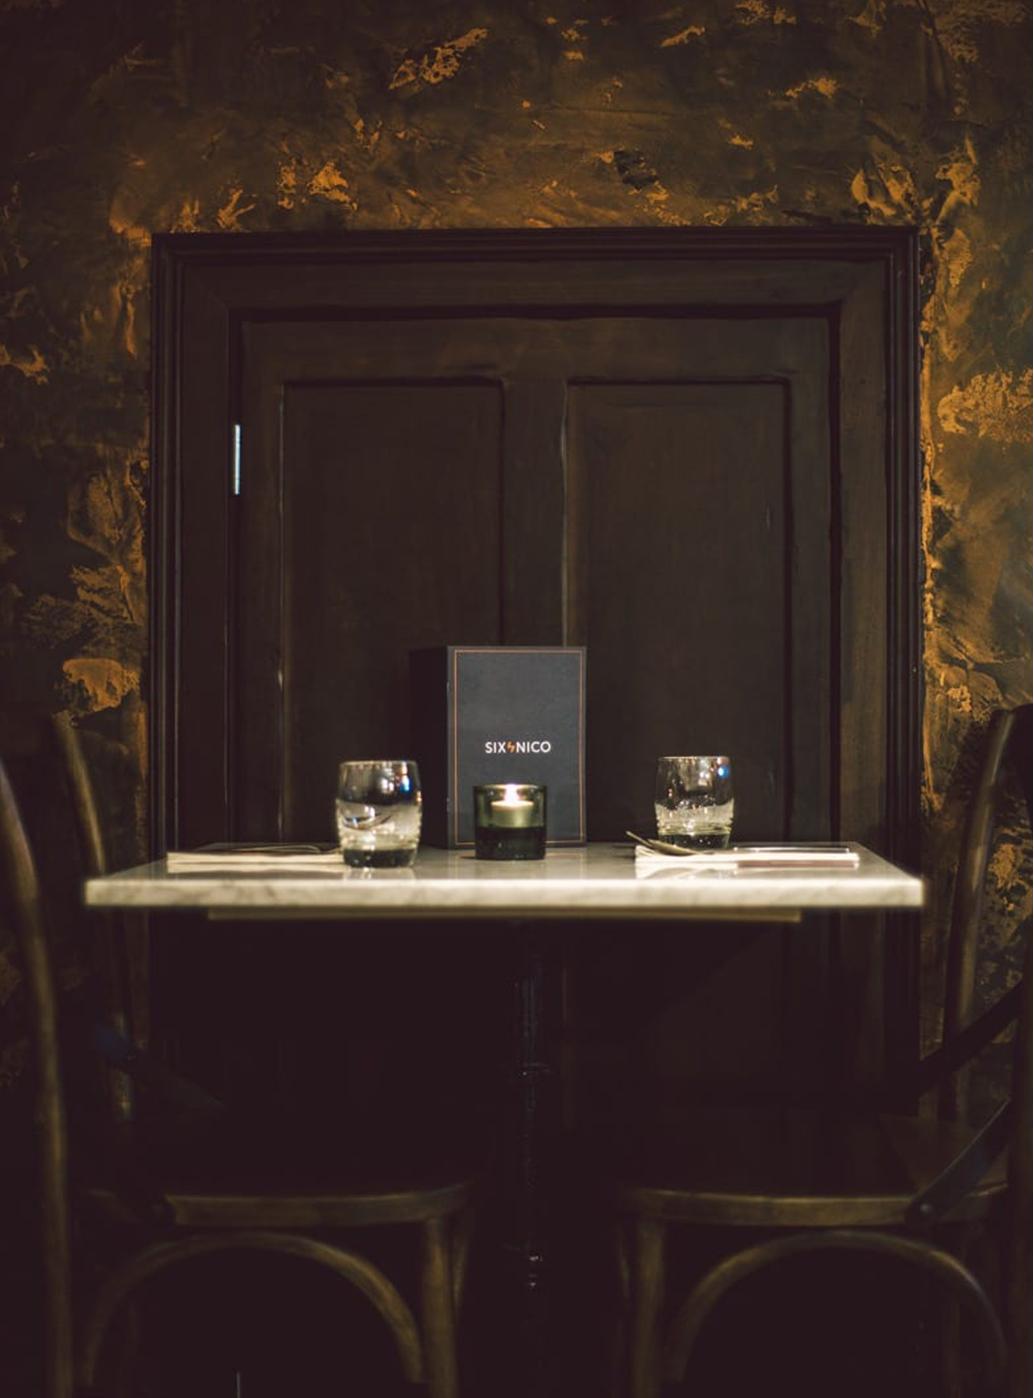 The moody interior of Six by Nico restaurant in Edinburgh